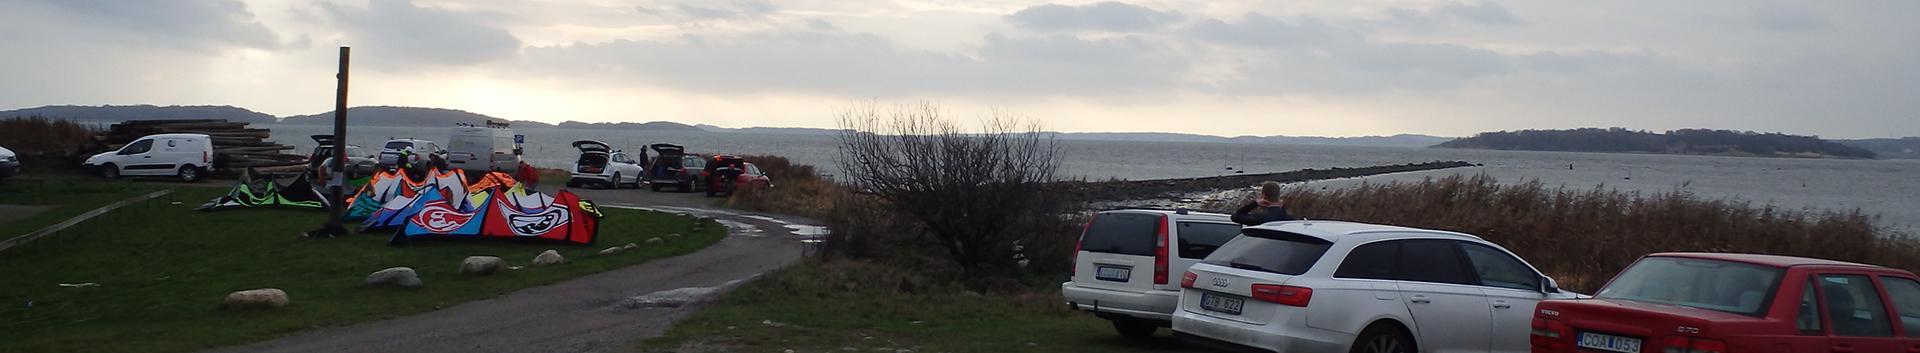 torkelstorp kite